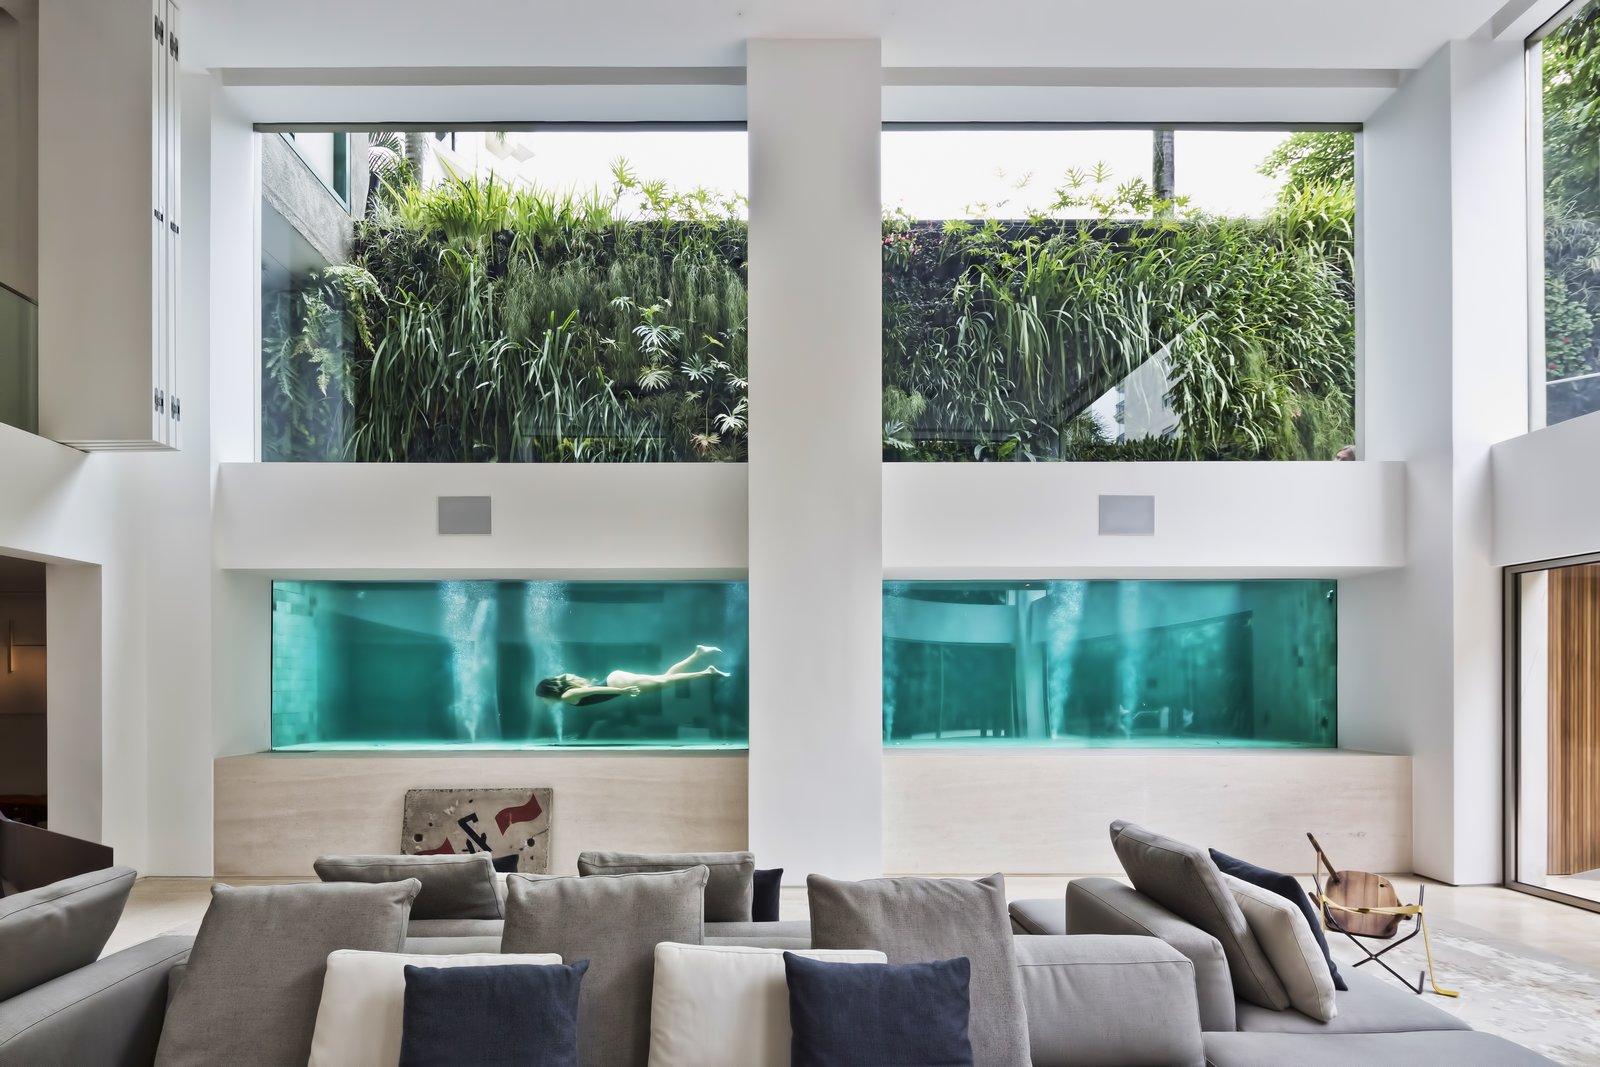 A Mesmerizing Pool Dominates This Brazilian Home